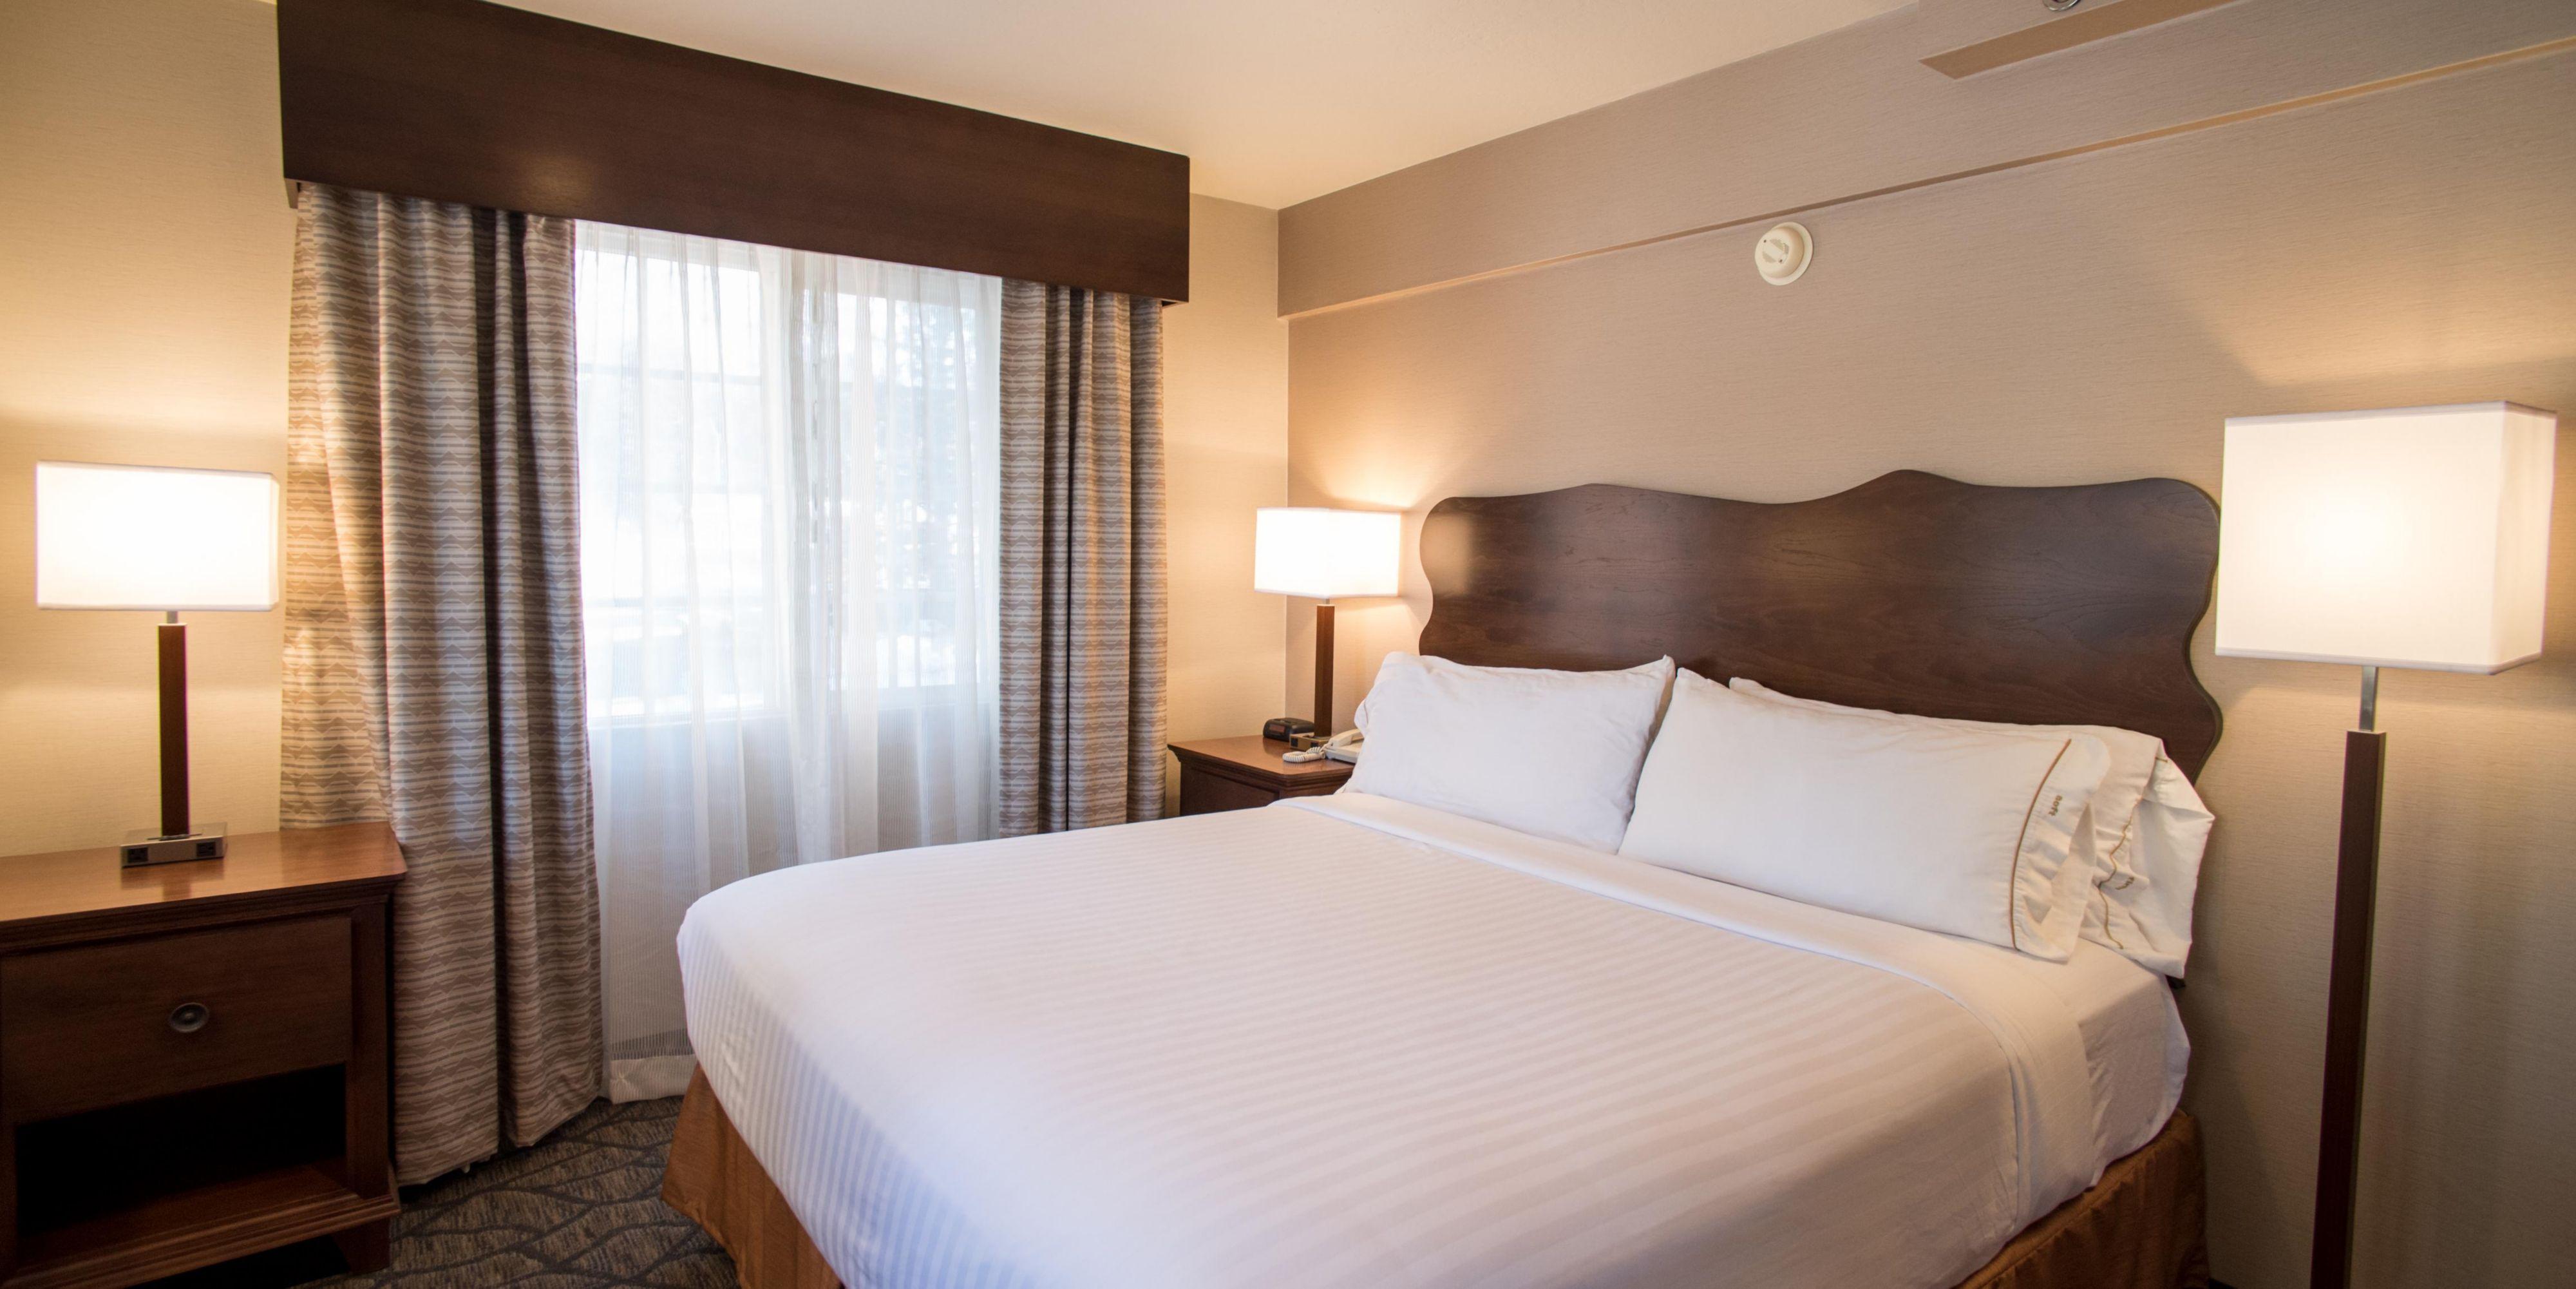 Charmant Holiday Inn Express South Lake Tahoe 4987735835 2x1